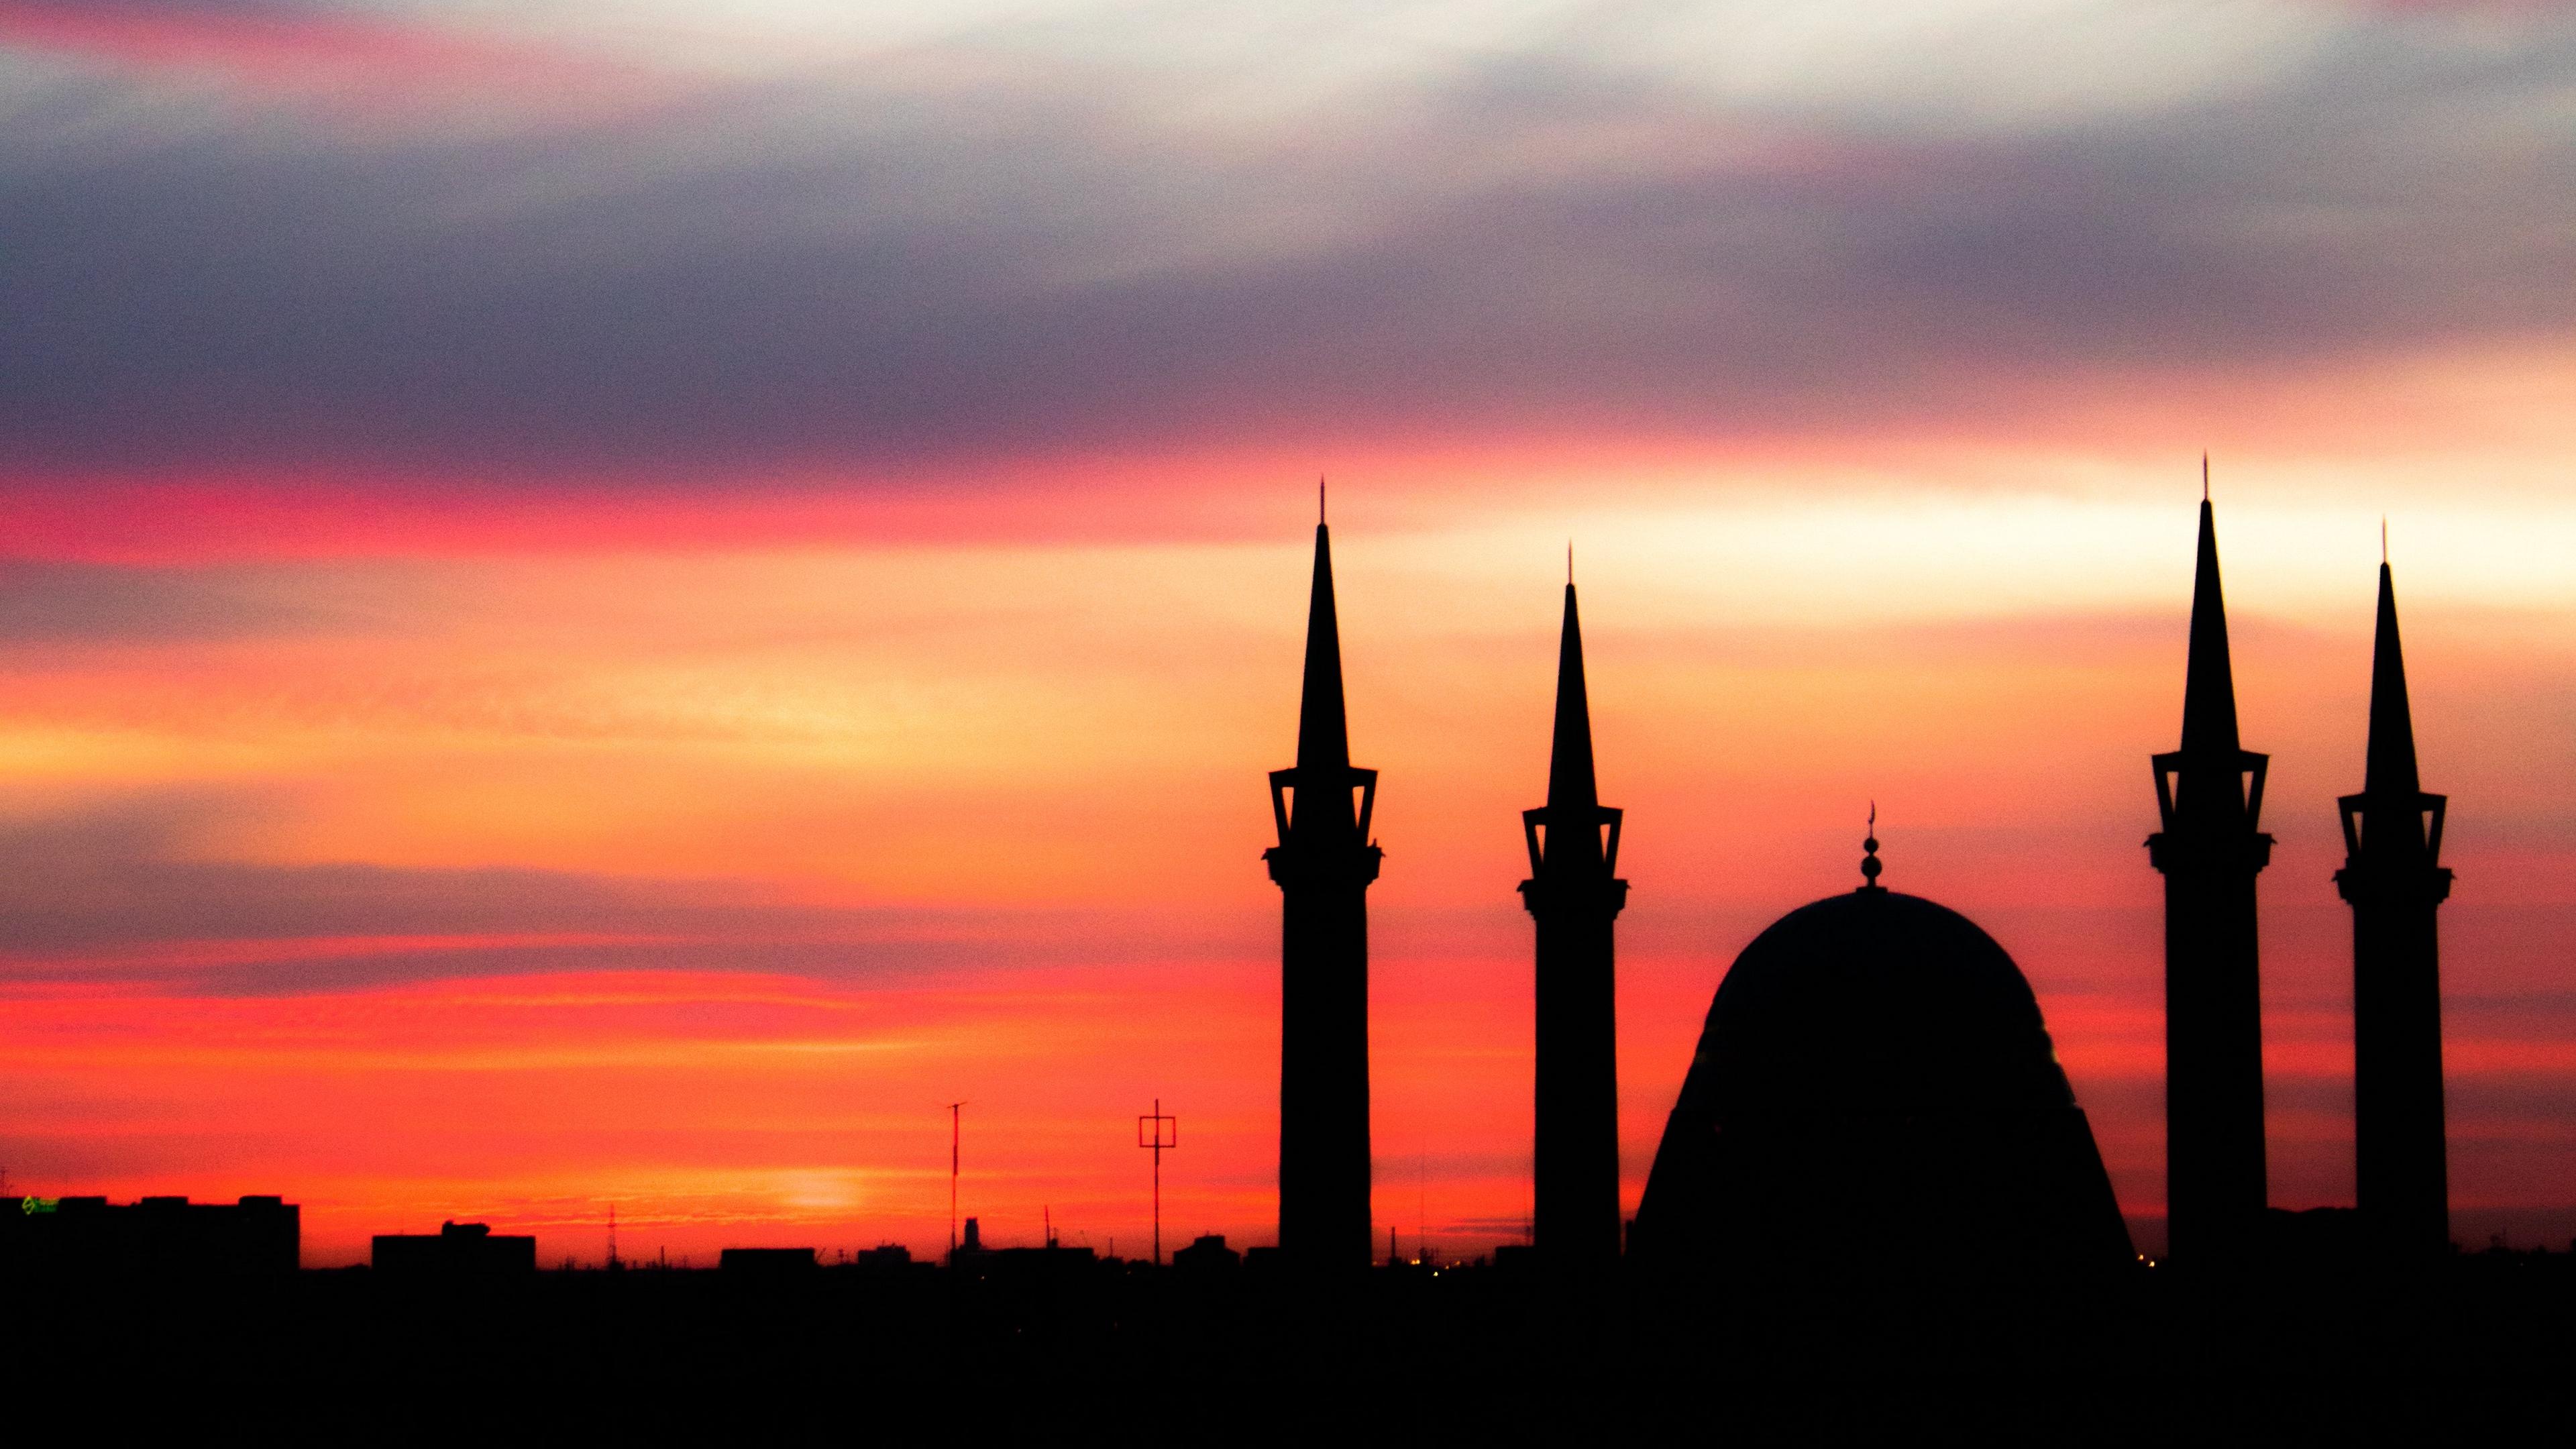 sunset architecture mosque sky 4k 1538064676 - sunset, architecture, mosque, sky 4k - sunset, Mosque, Architecture